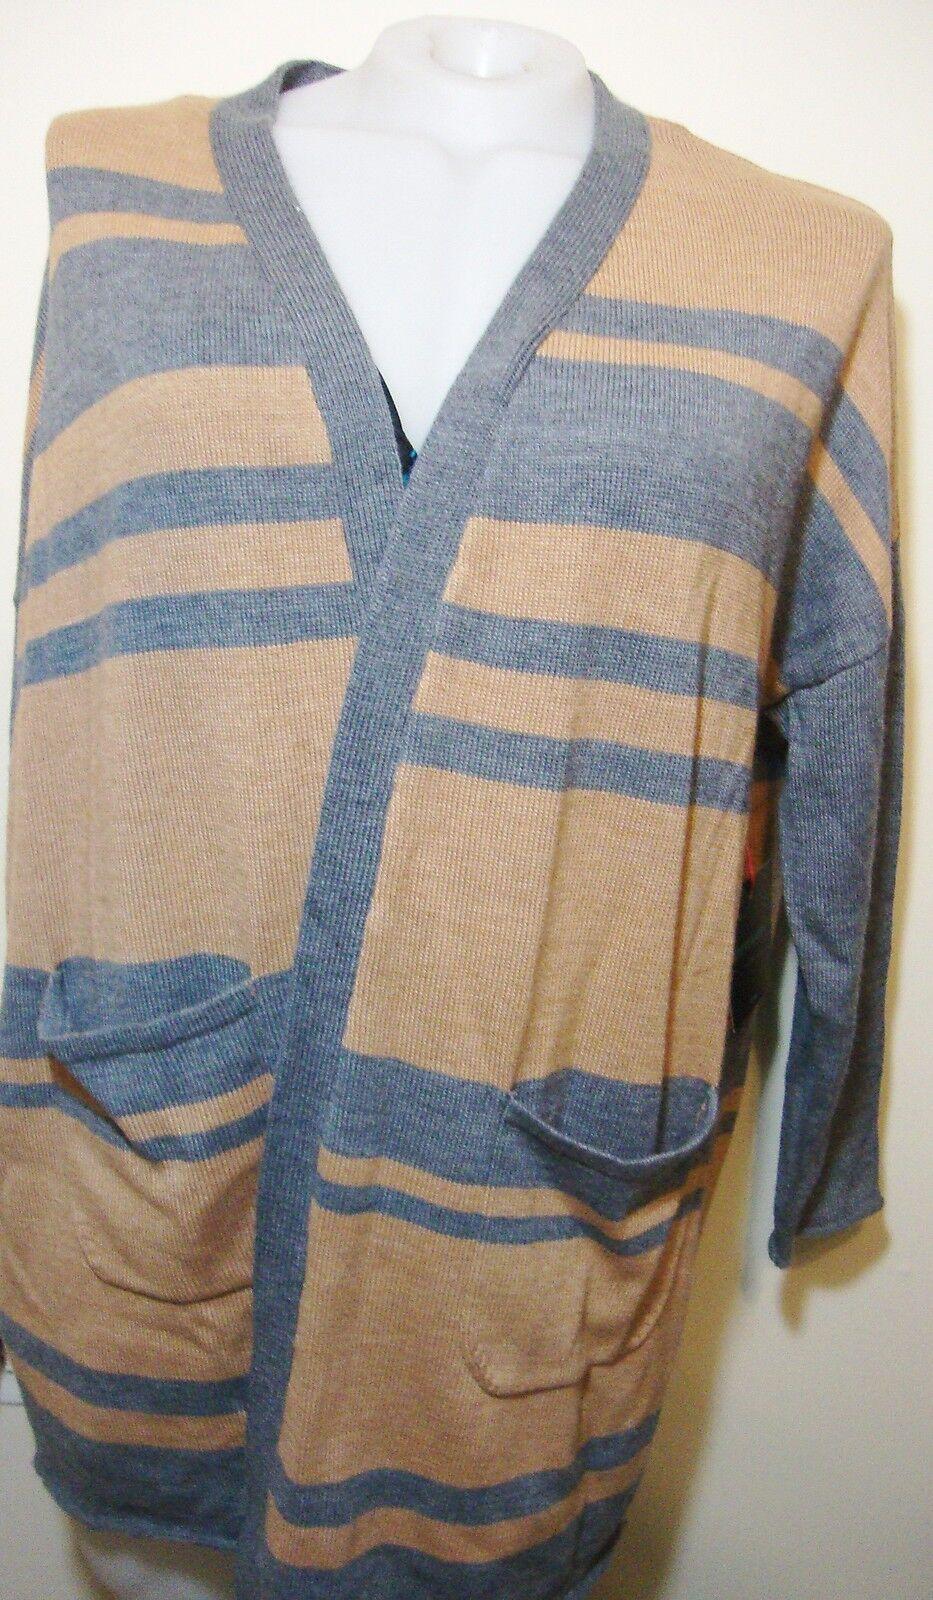 Cynthia Rowley Striped Merino Wool Cardigan Sweater Womens Plus 2X